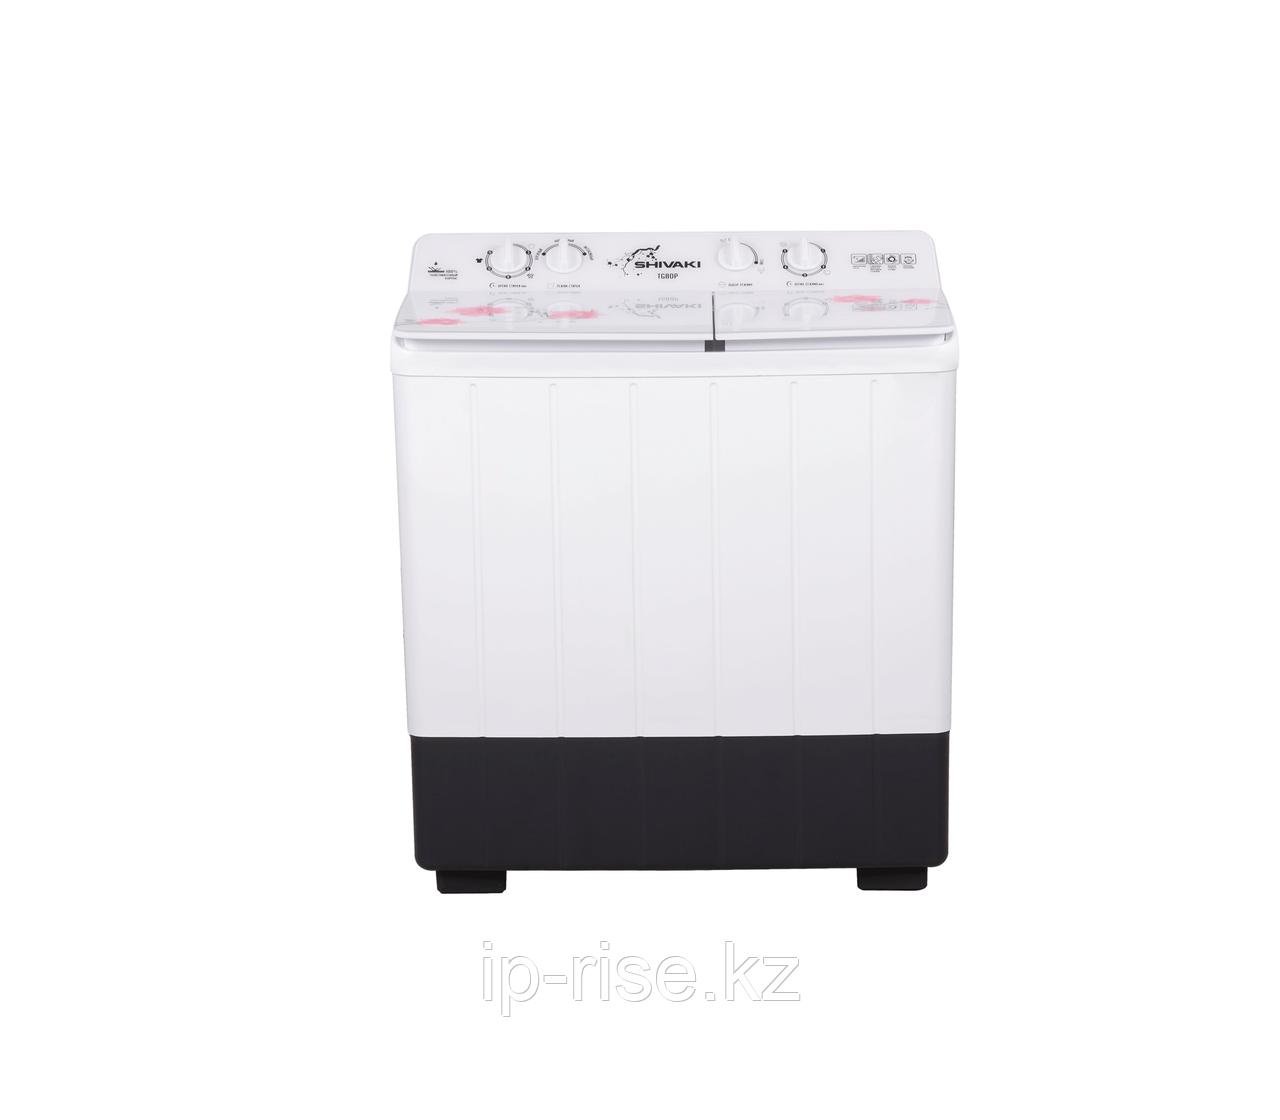 SHIVAKI TG 80 P white-pink